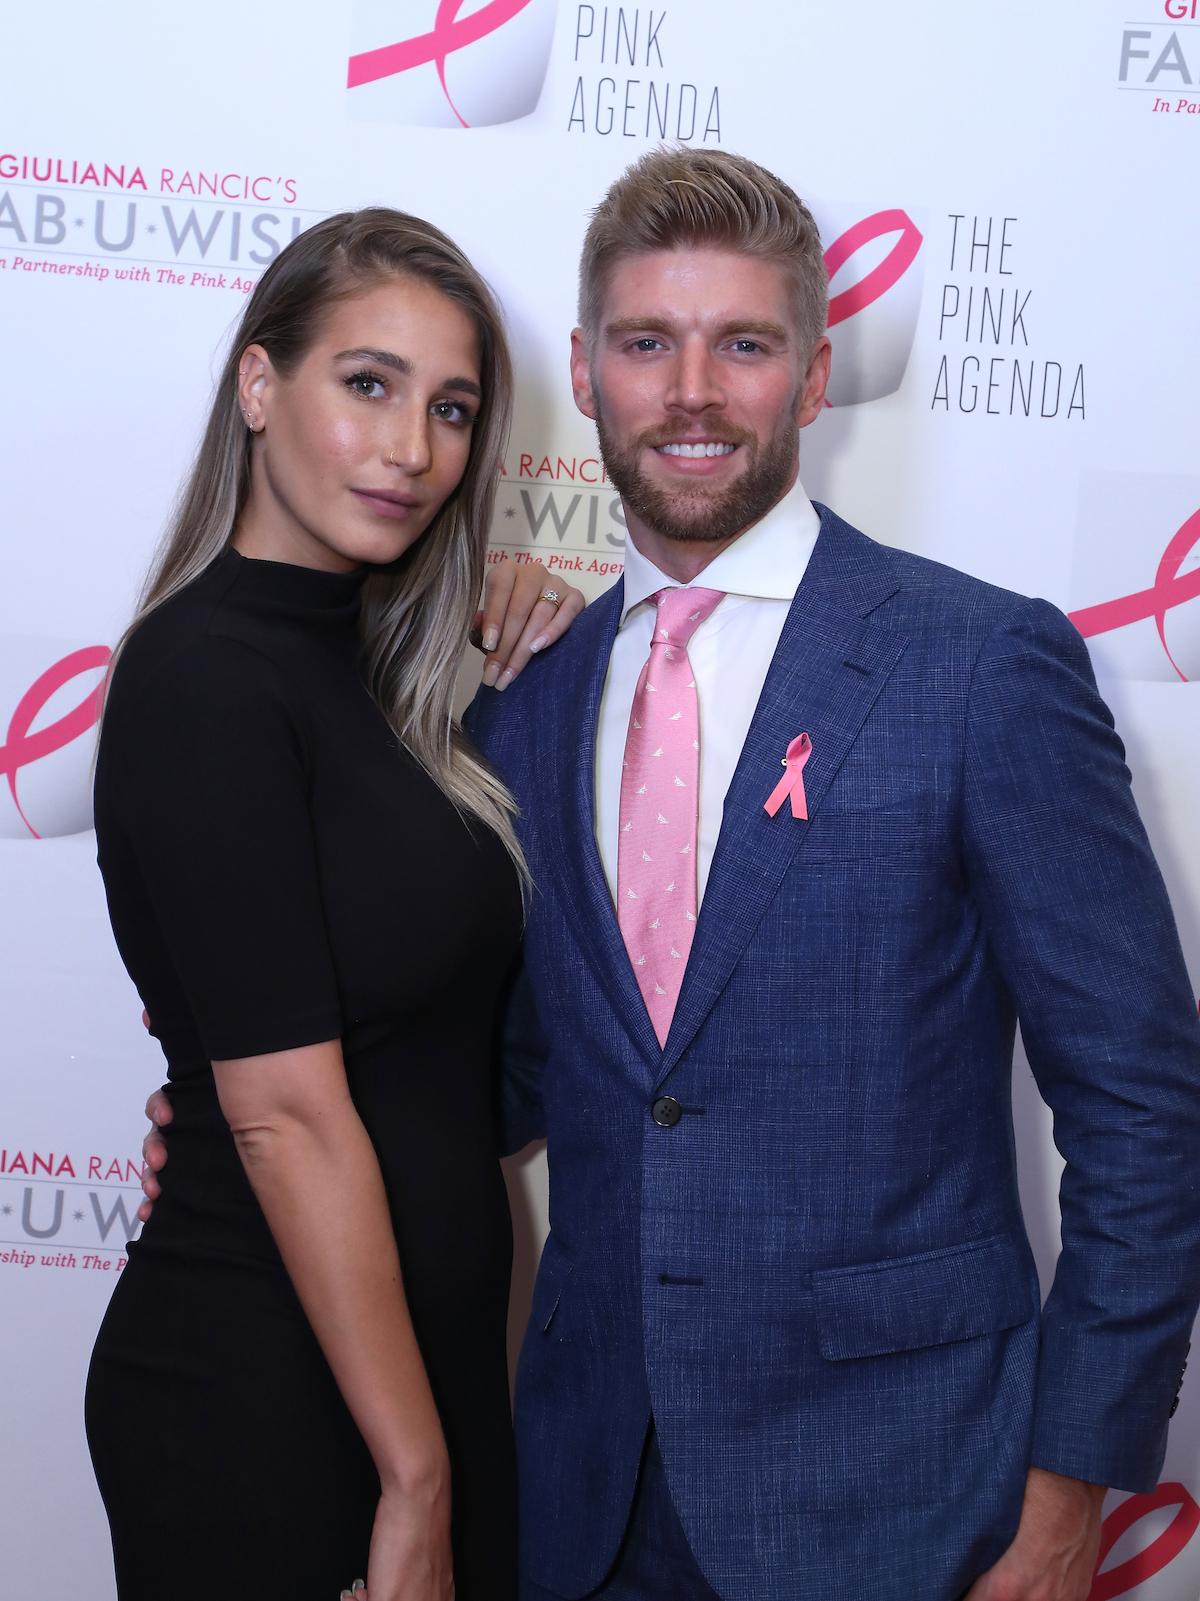 Amanda Batula and Kyle Cooke pose together at an event.